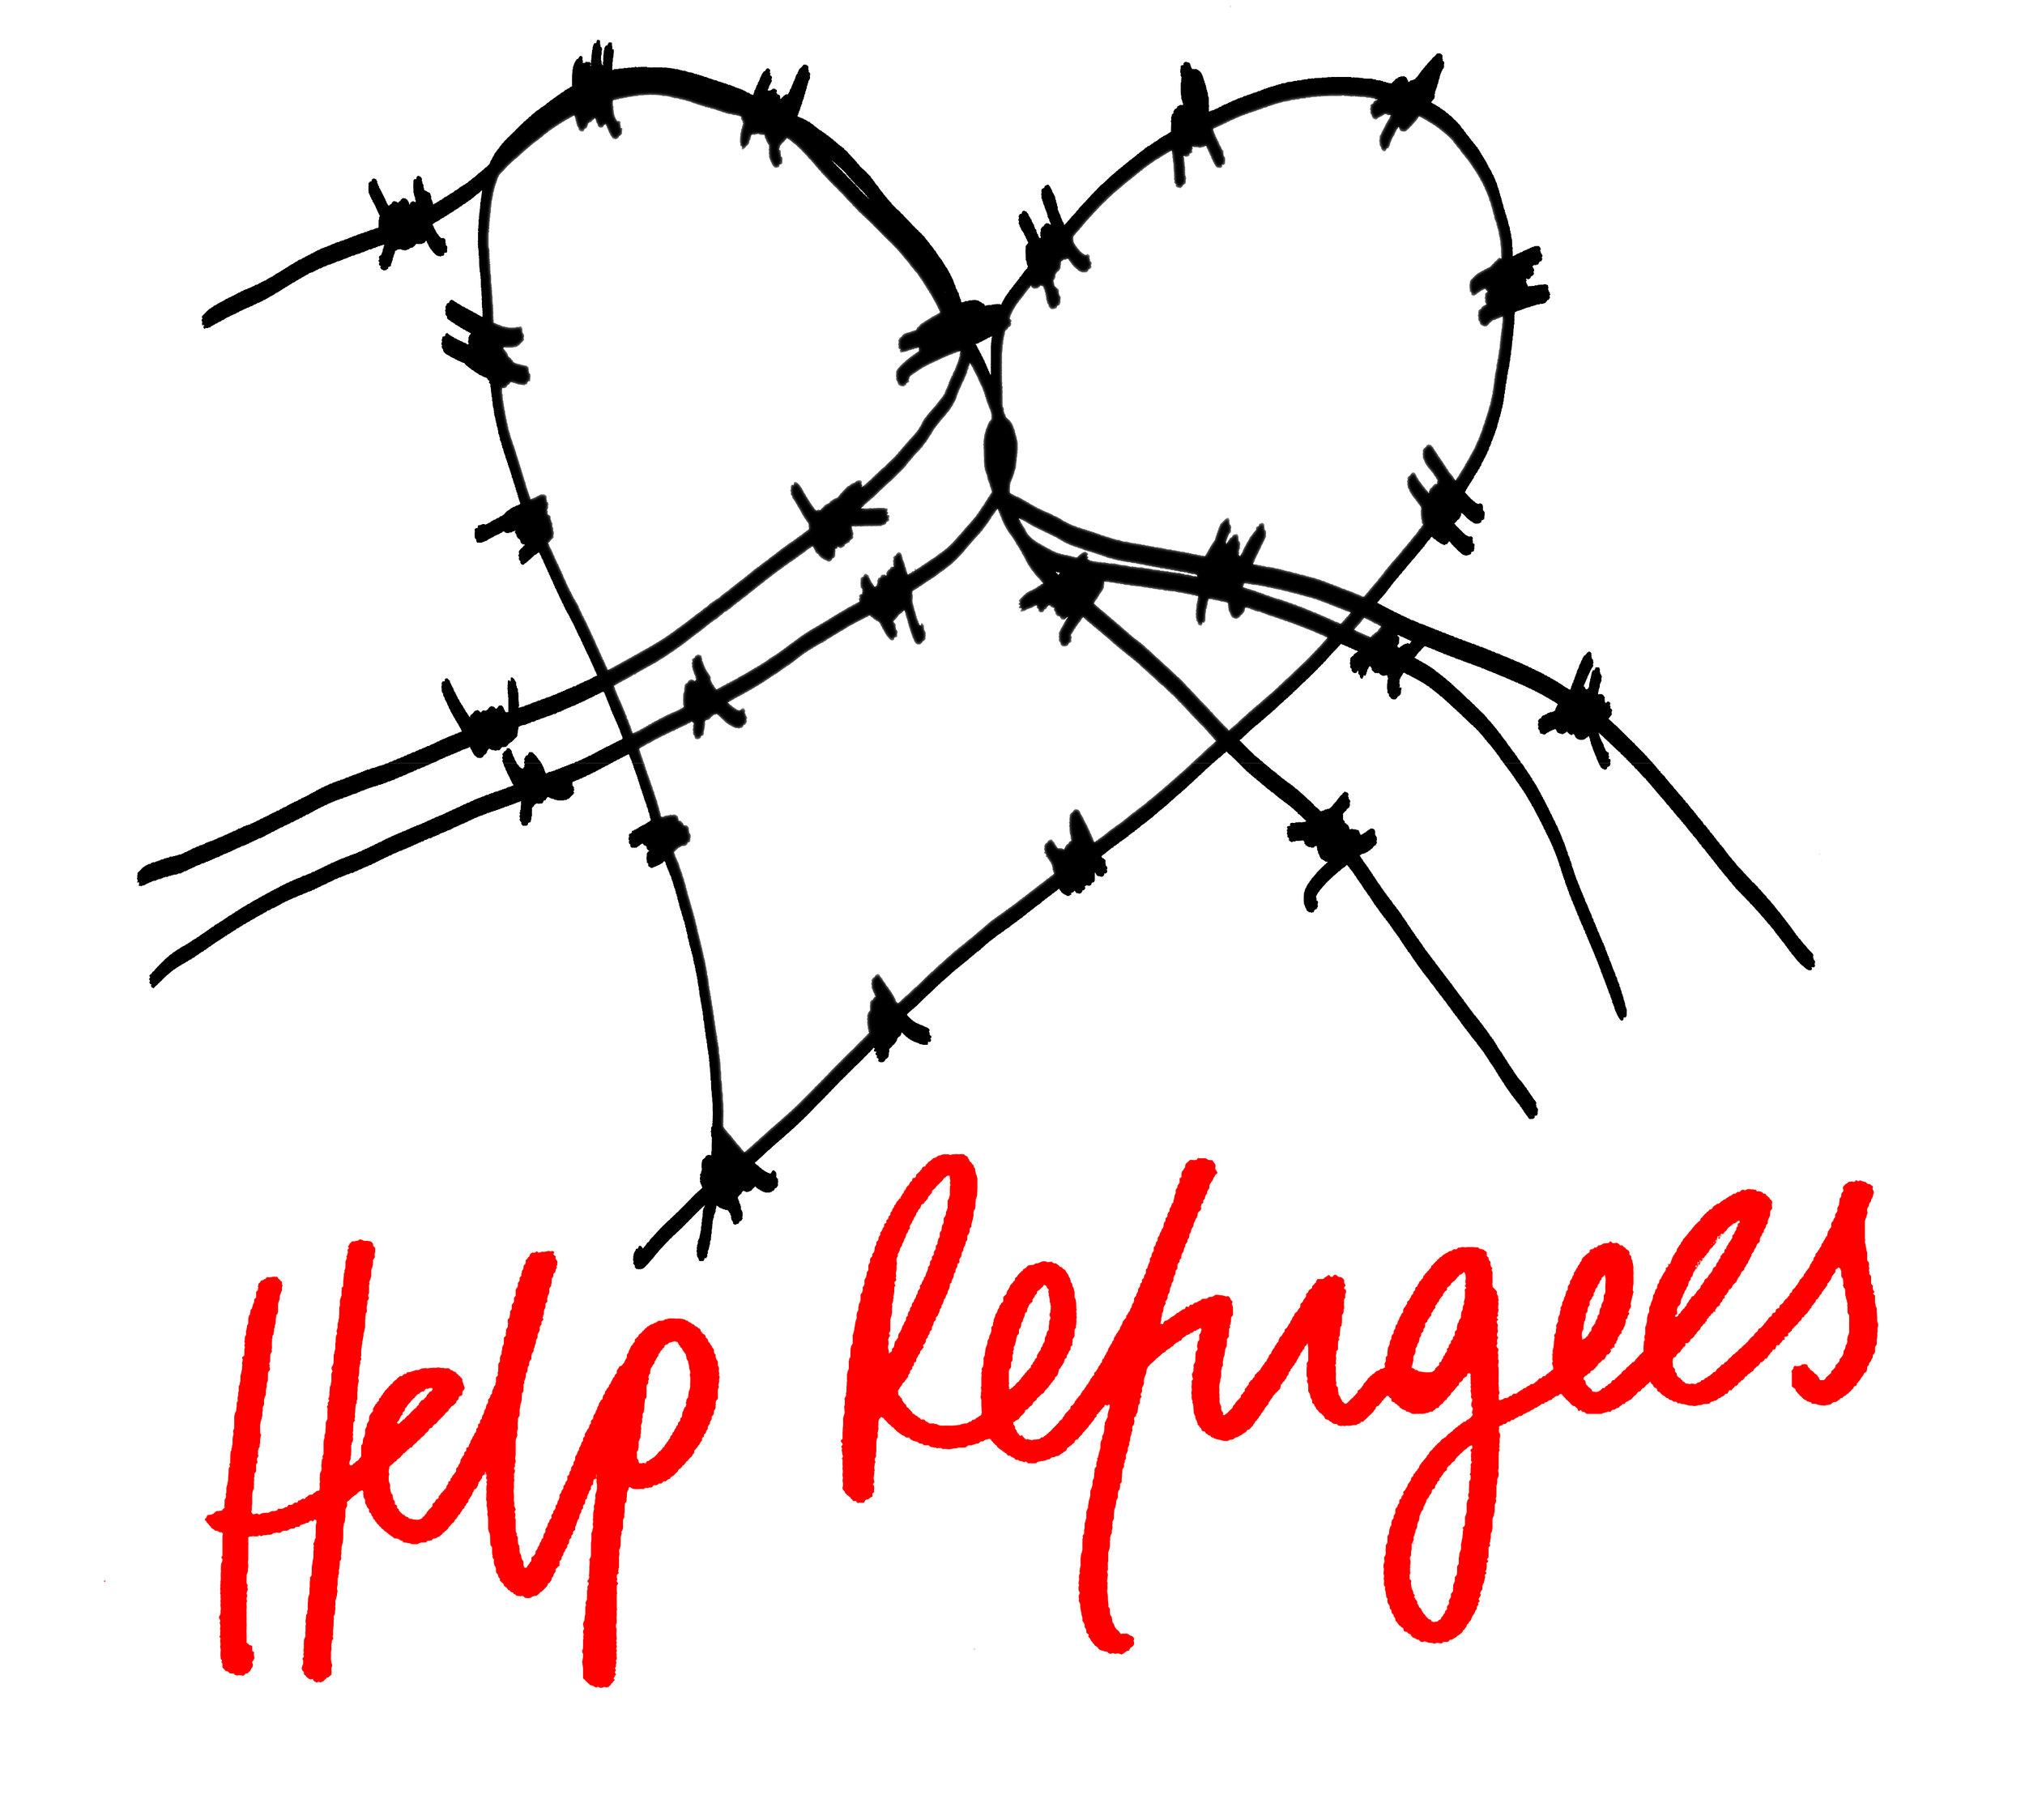 Help Refugees logo, Hayden Kays